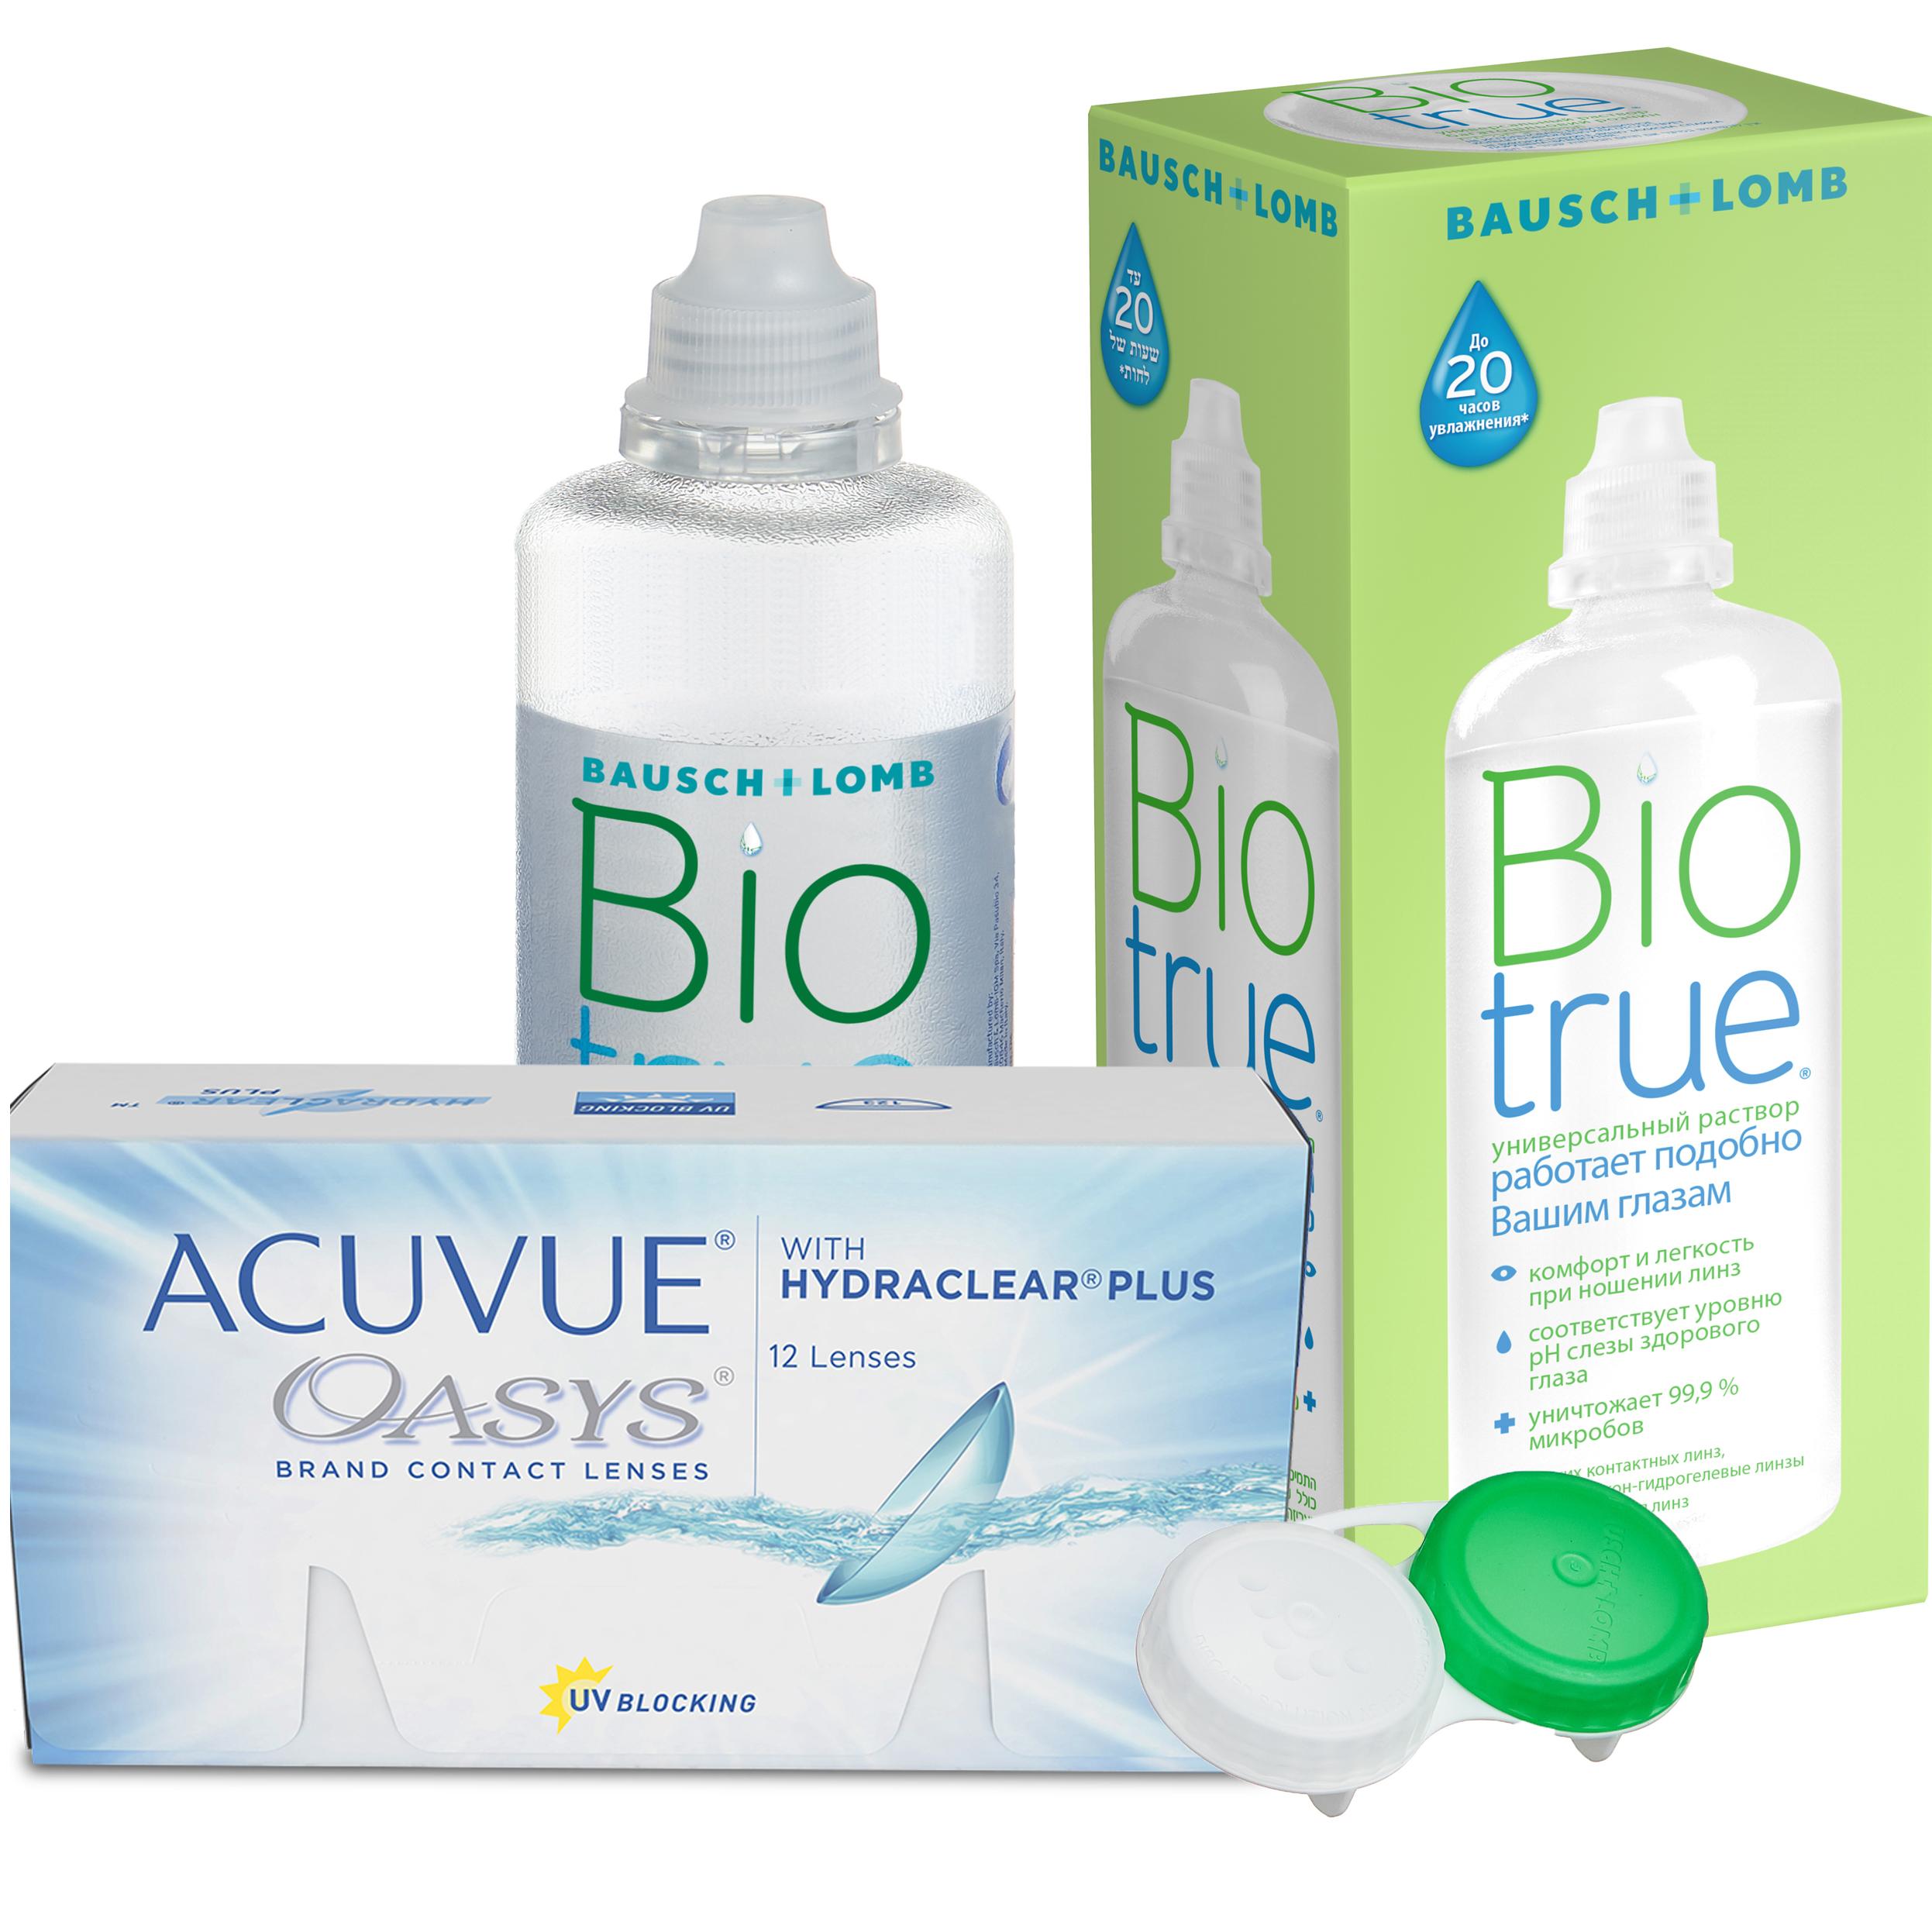 Купить Oasys with Hydraclear Plus 12 линз + Biotrue, Контактные линзы Acuvue Oasys with Hydraclear Plus 12 линз R 8.4 -1, 25 + Biotrue 300 мл